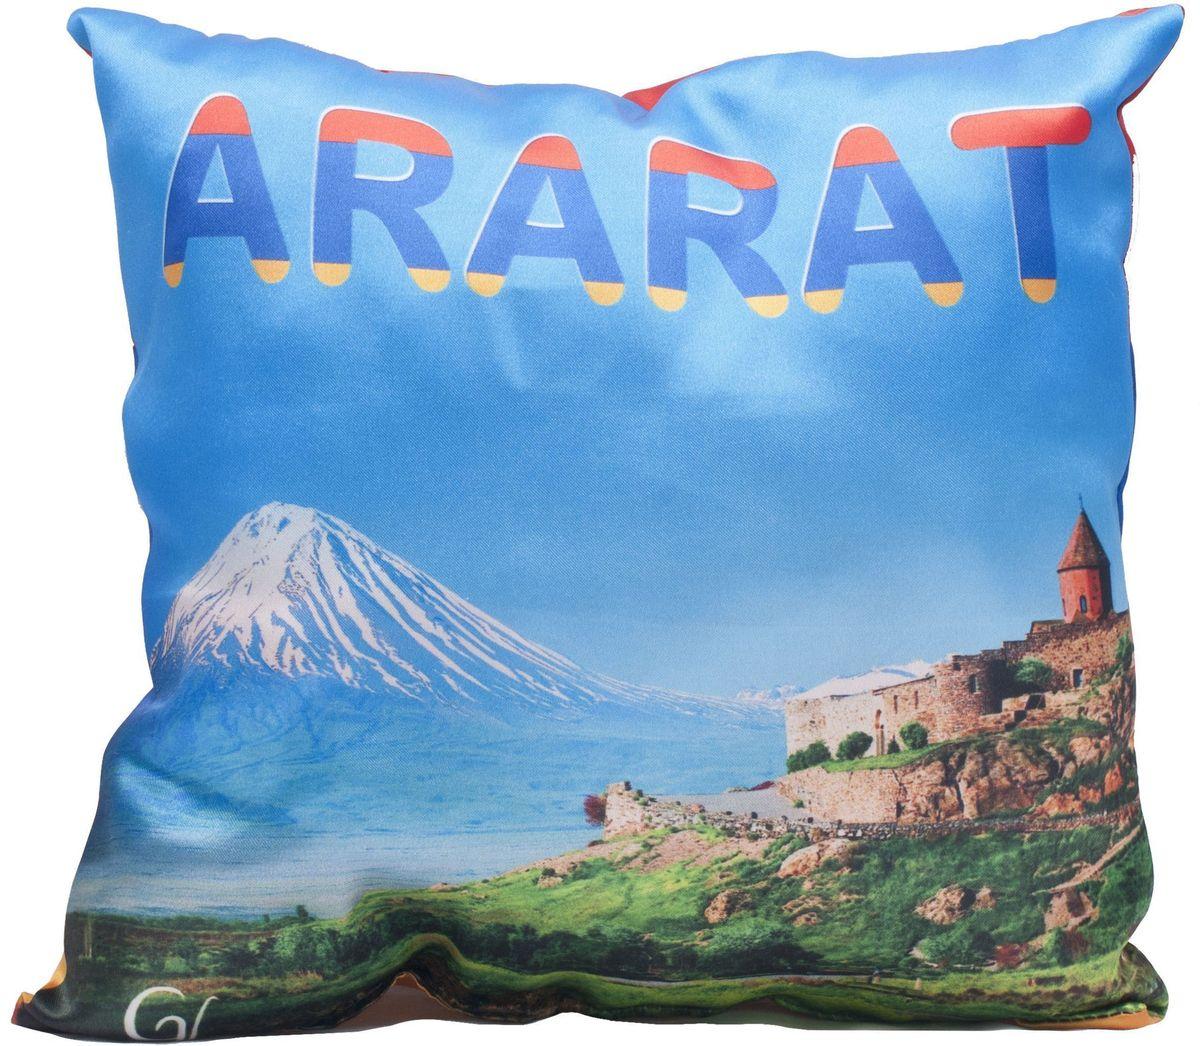 Подушка декоративная Главдор GL-520. Армения-Арарат, с рисунком, 30х30 см21395598Декоративные подушки c апликацией в салон автомобиля.